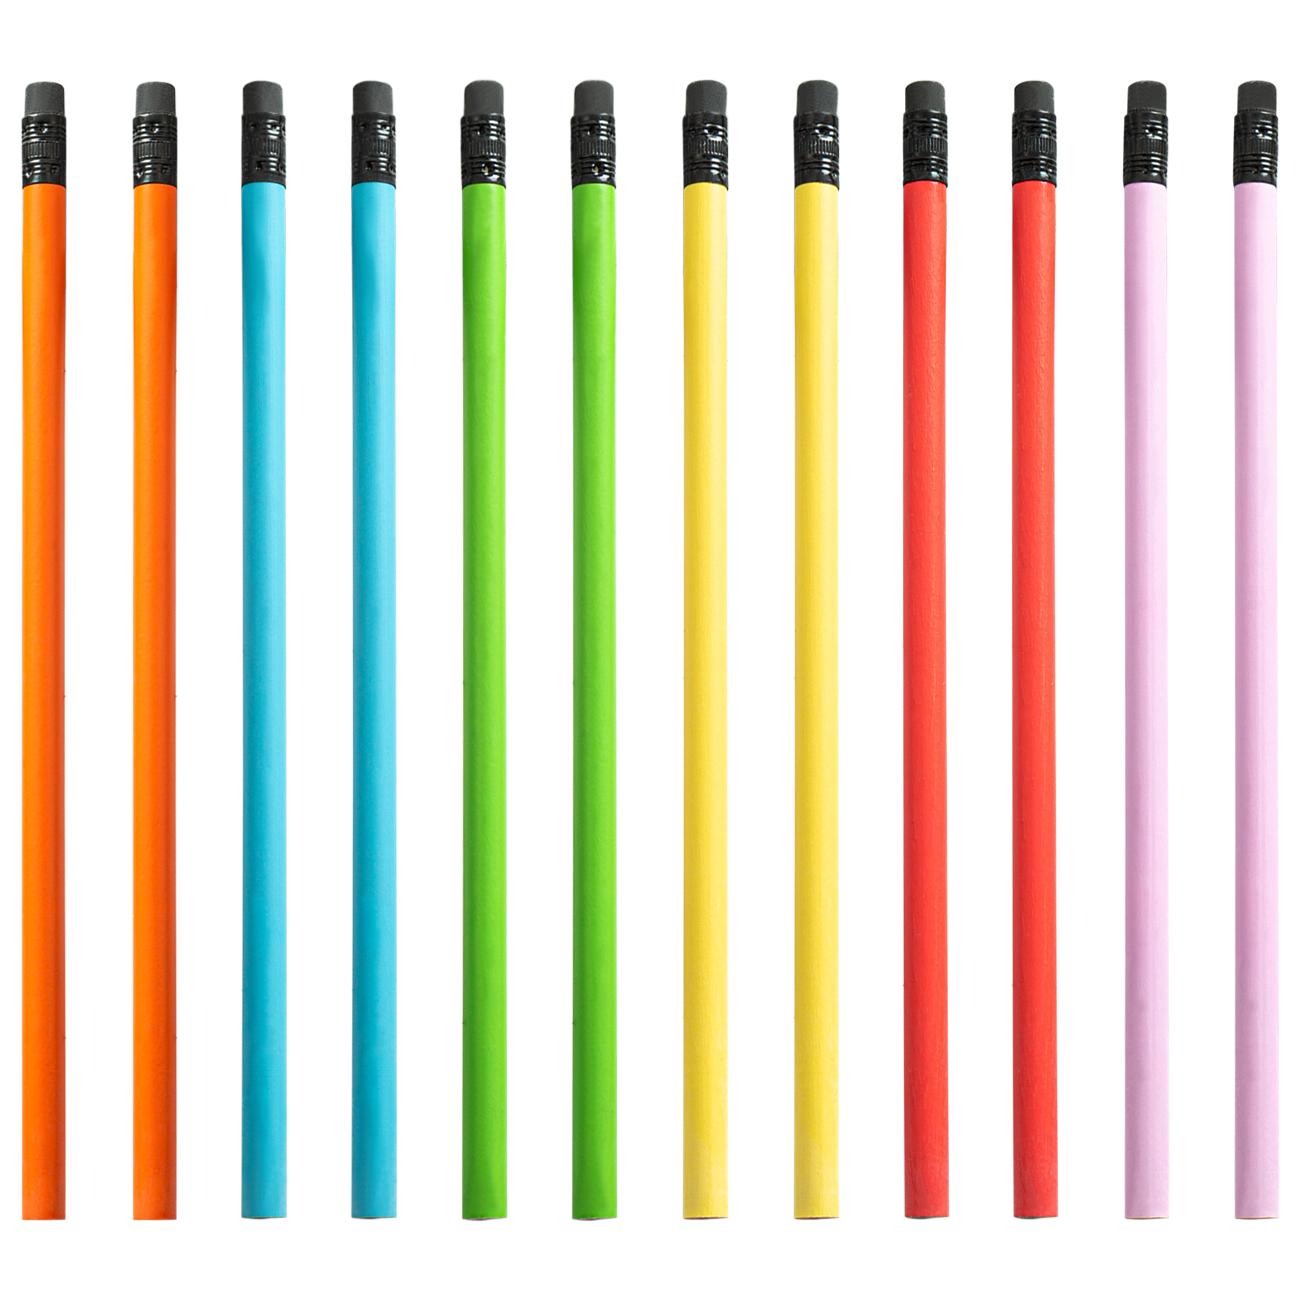 Promotion Custom logo printed pencil wooden pencil with eraser pencils with eraser